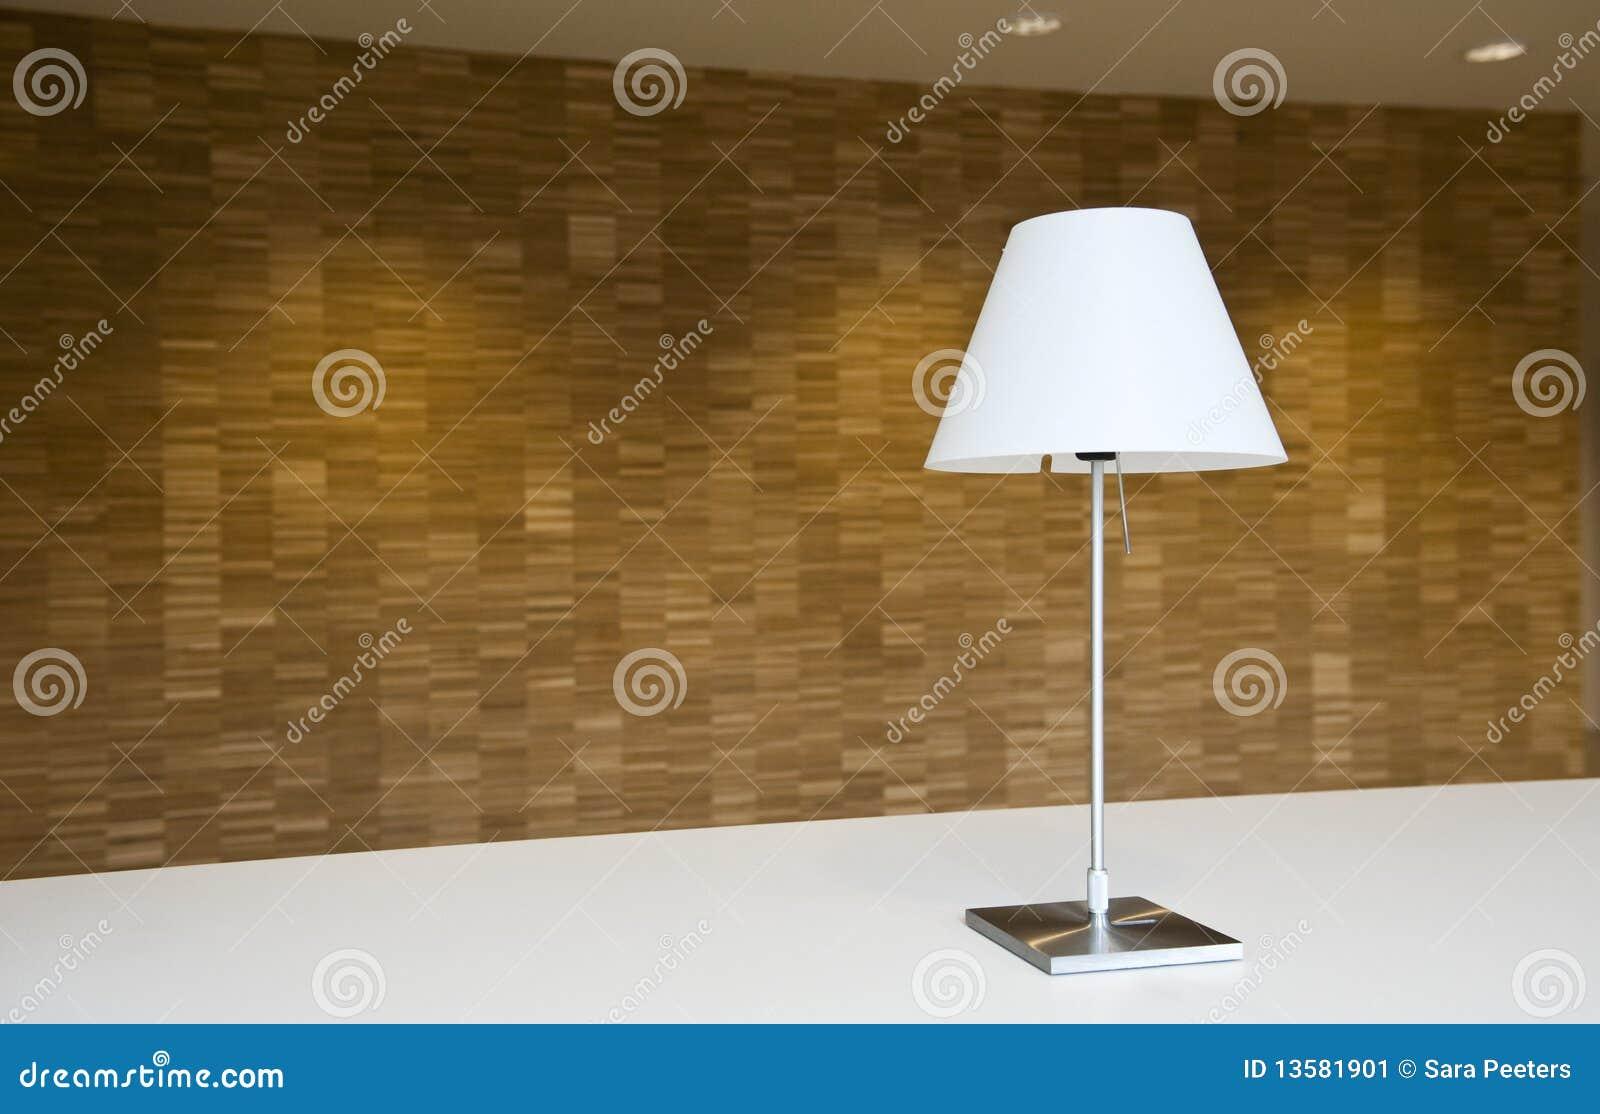 стена светильника